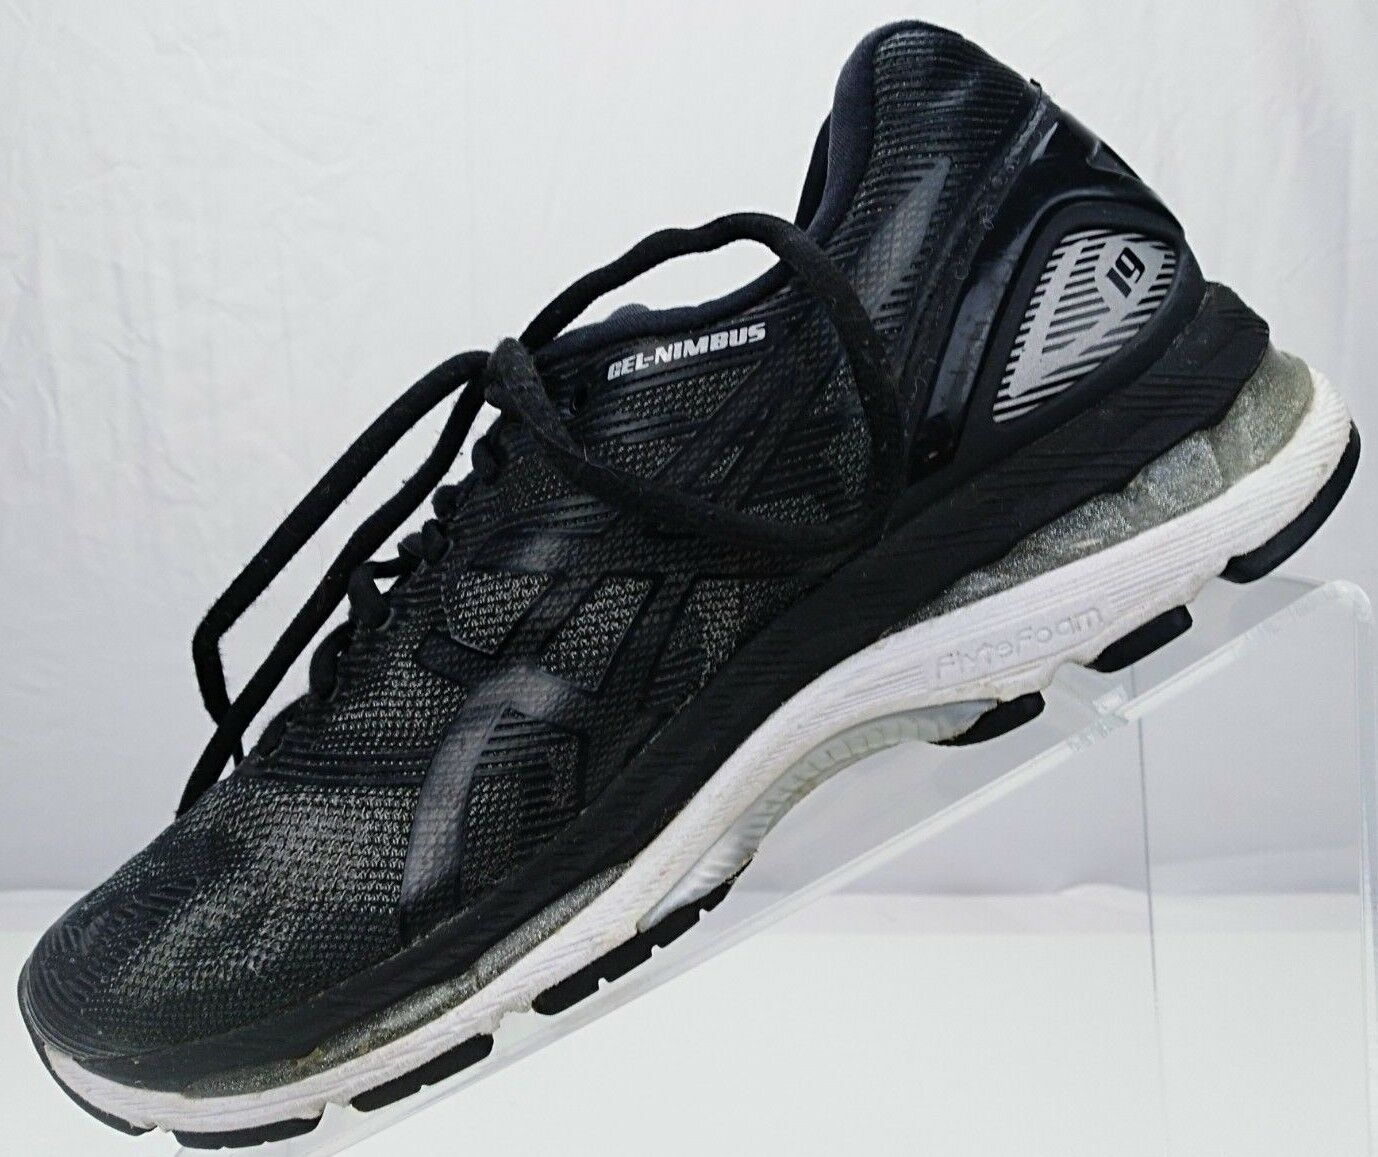 Asics Gel Nimbus 19 - - - Running Training Athletic scarpe da ginnastica donna Dimensione 8.5 nero 4a5ae9